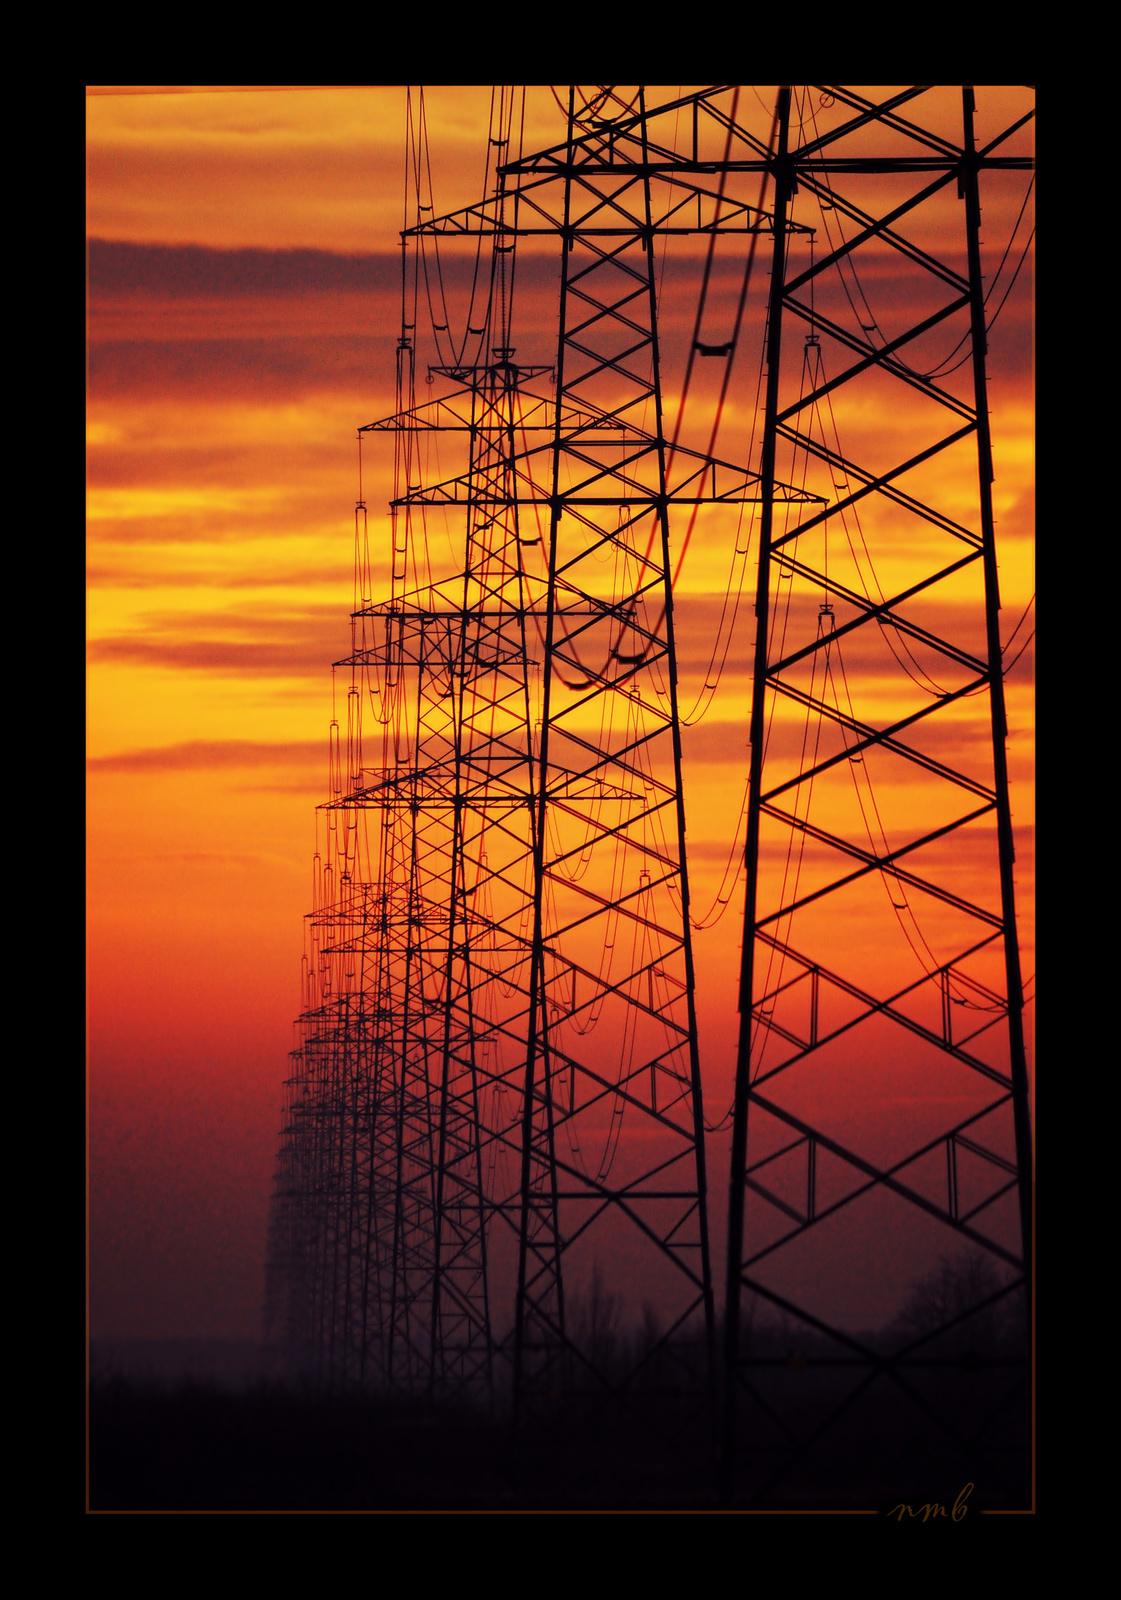 nmb: Sunset Energie